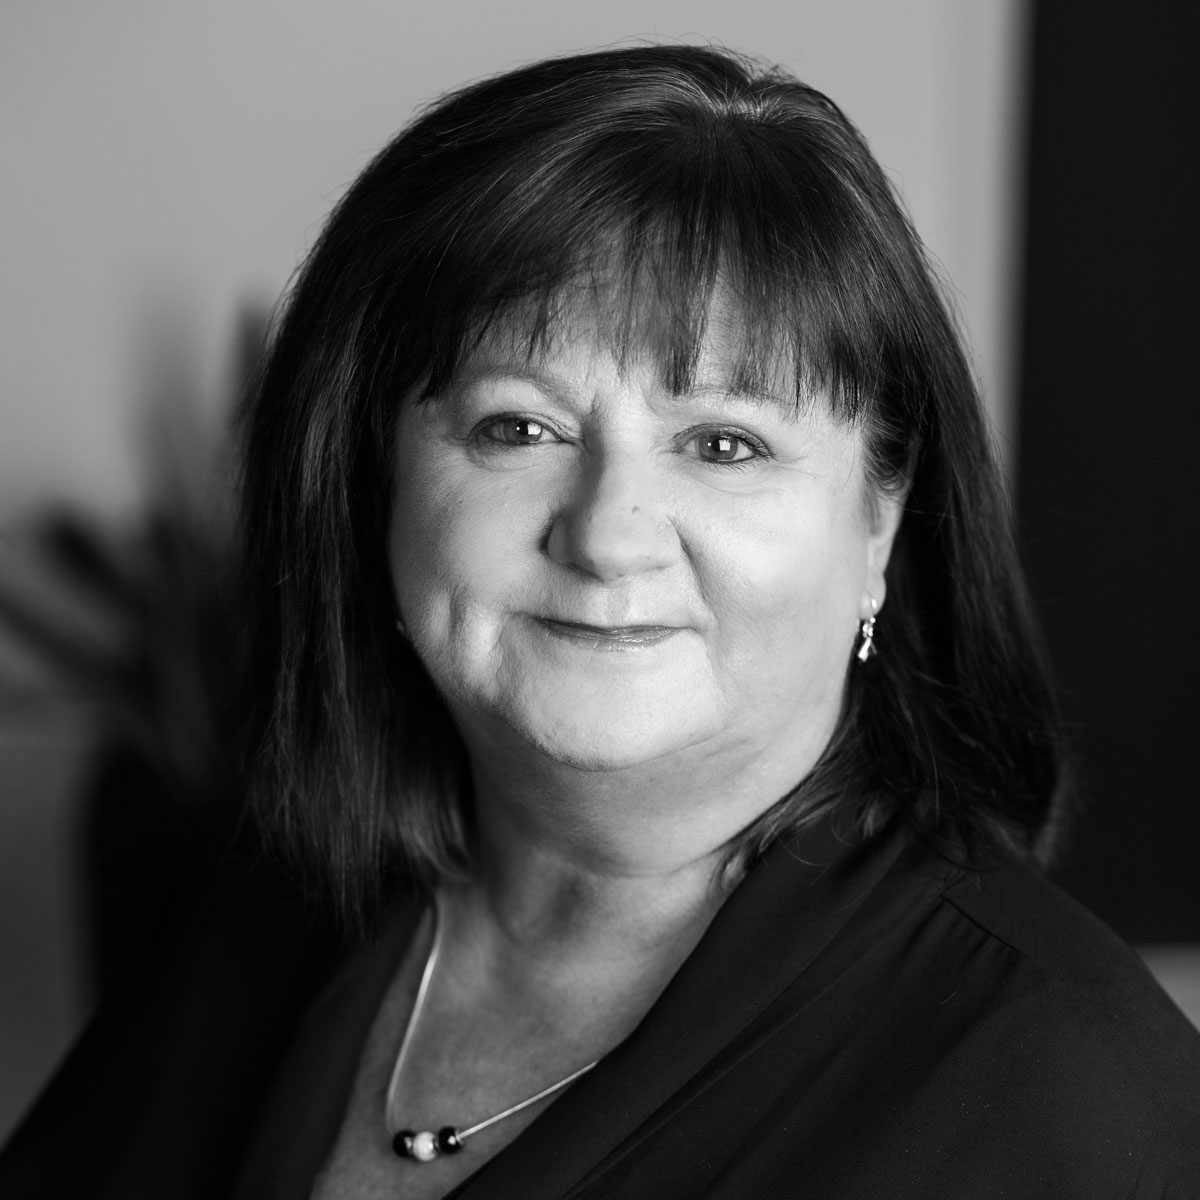 Sue Whitehead